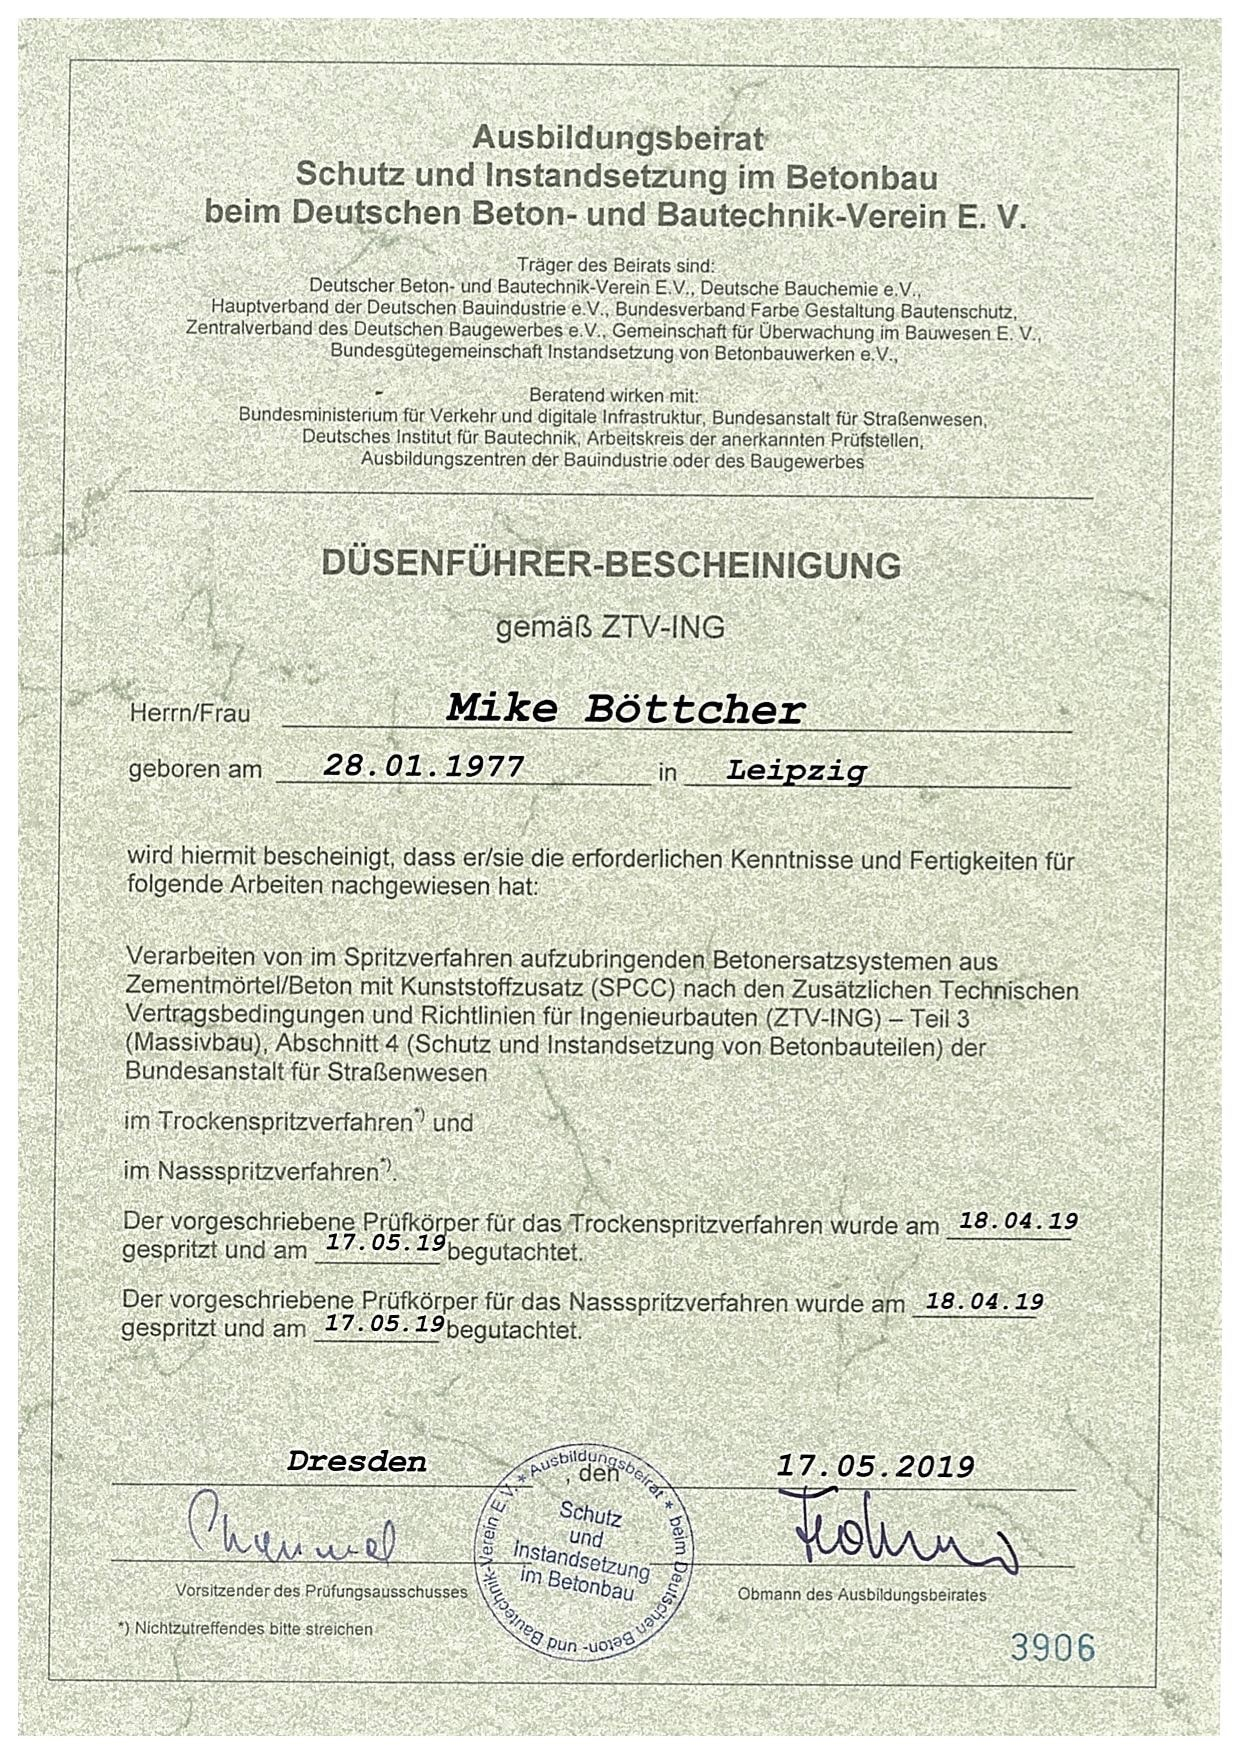 Düsenführer Bescheinigung Mike Böttcher